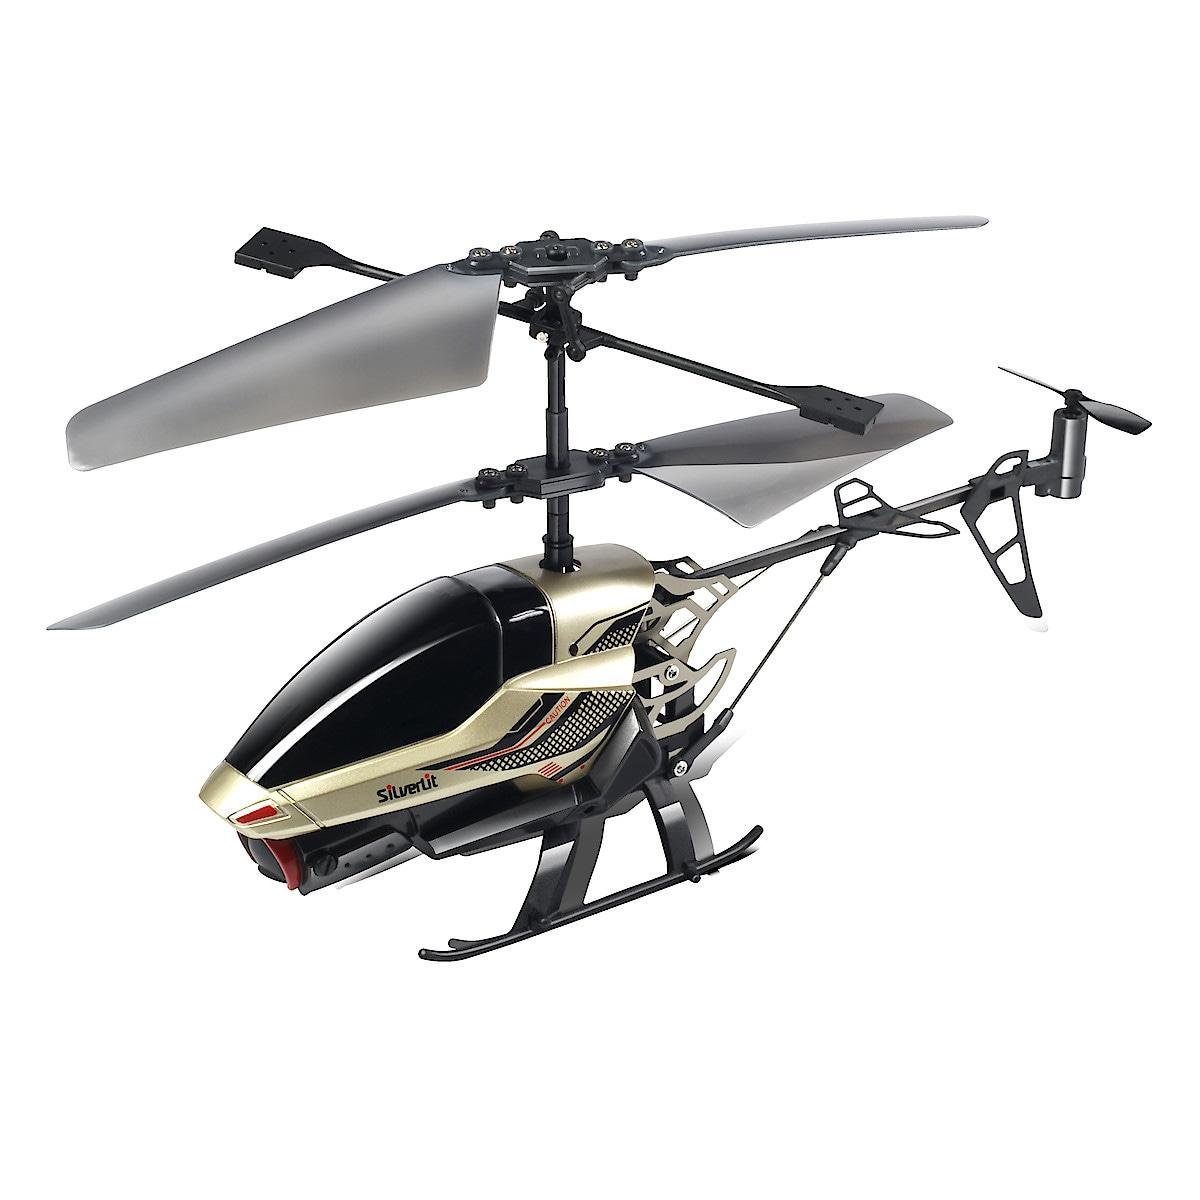 Radiostyrd helikopter med kamera Silverlit Heli Cam II